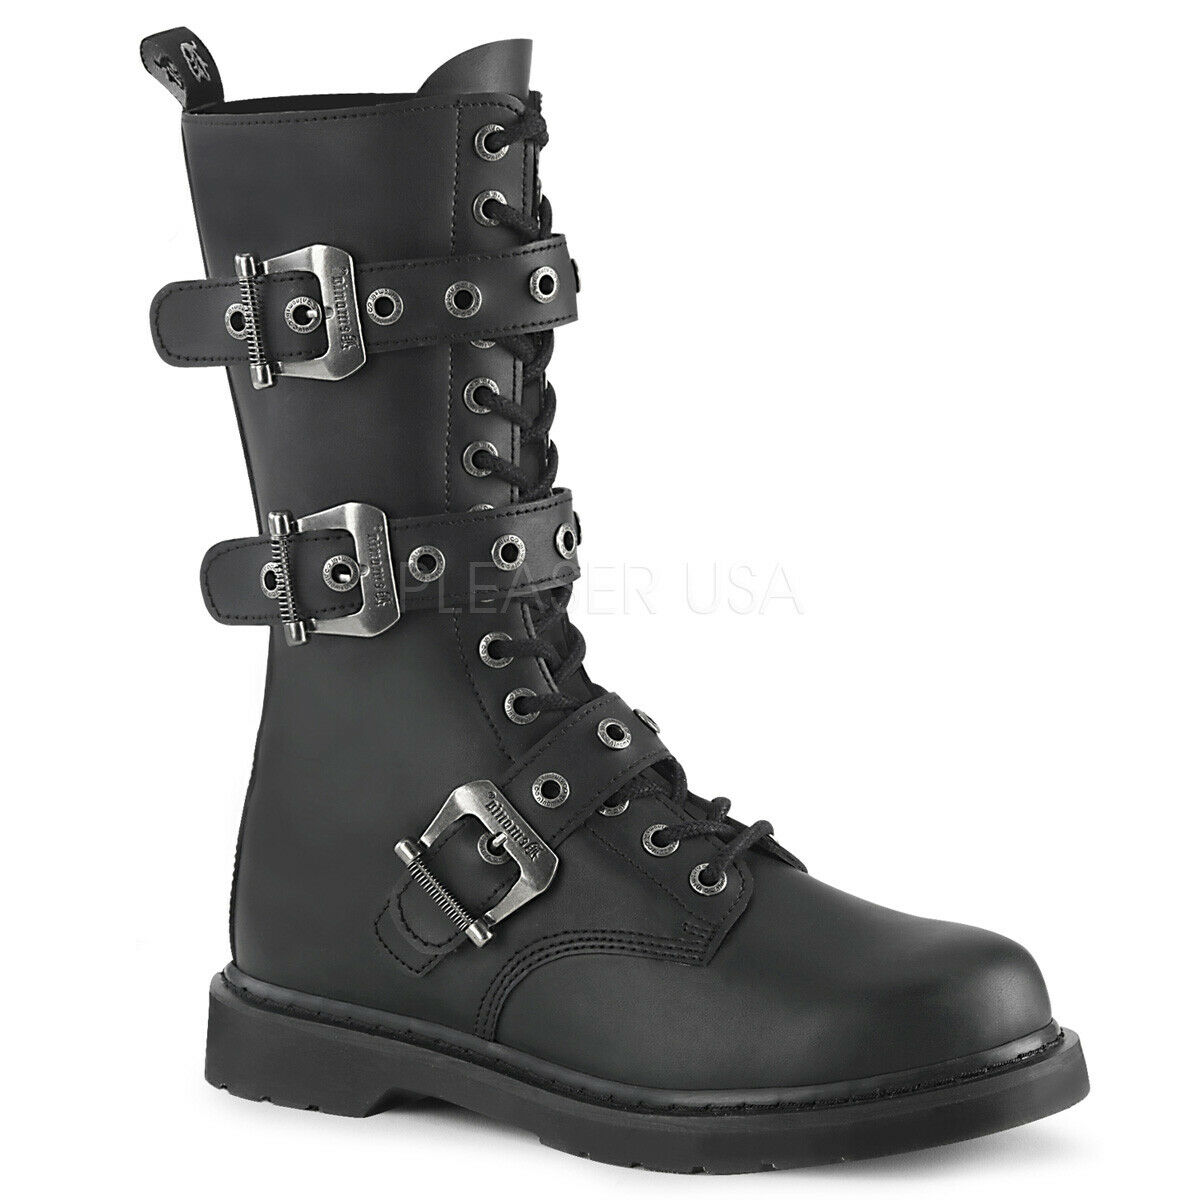 DEMONIA Women's Goth Military Biker Combat Buckles Vegan Black Mid Calf Boots